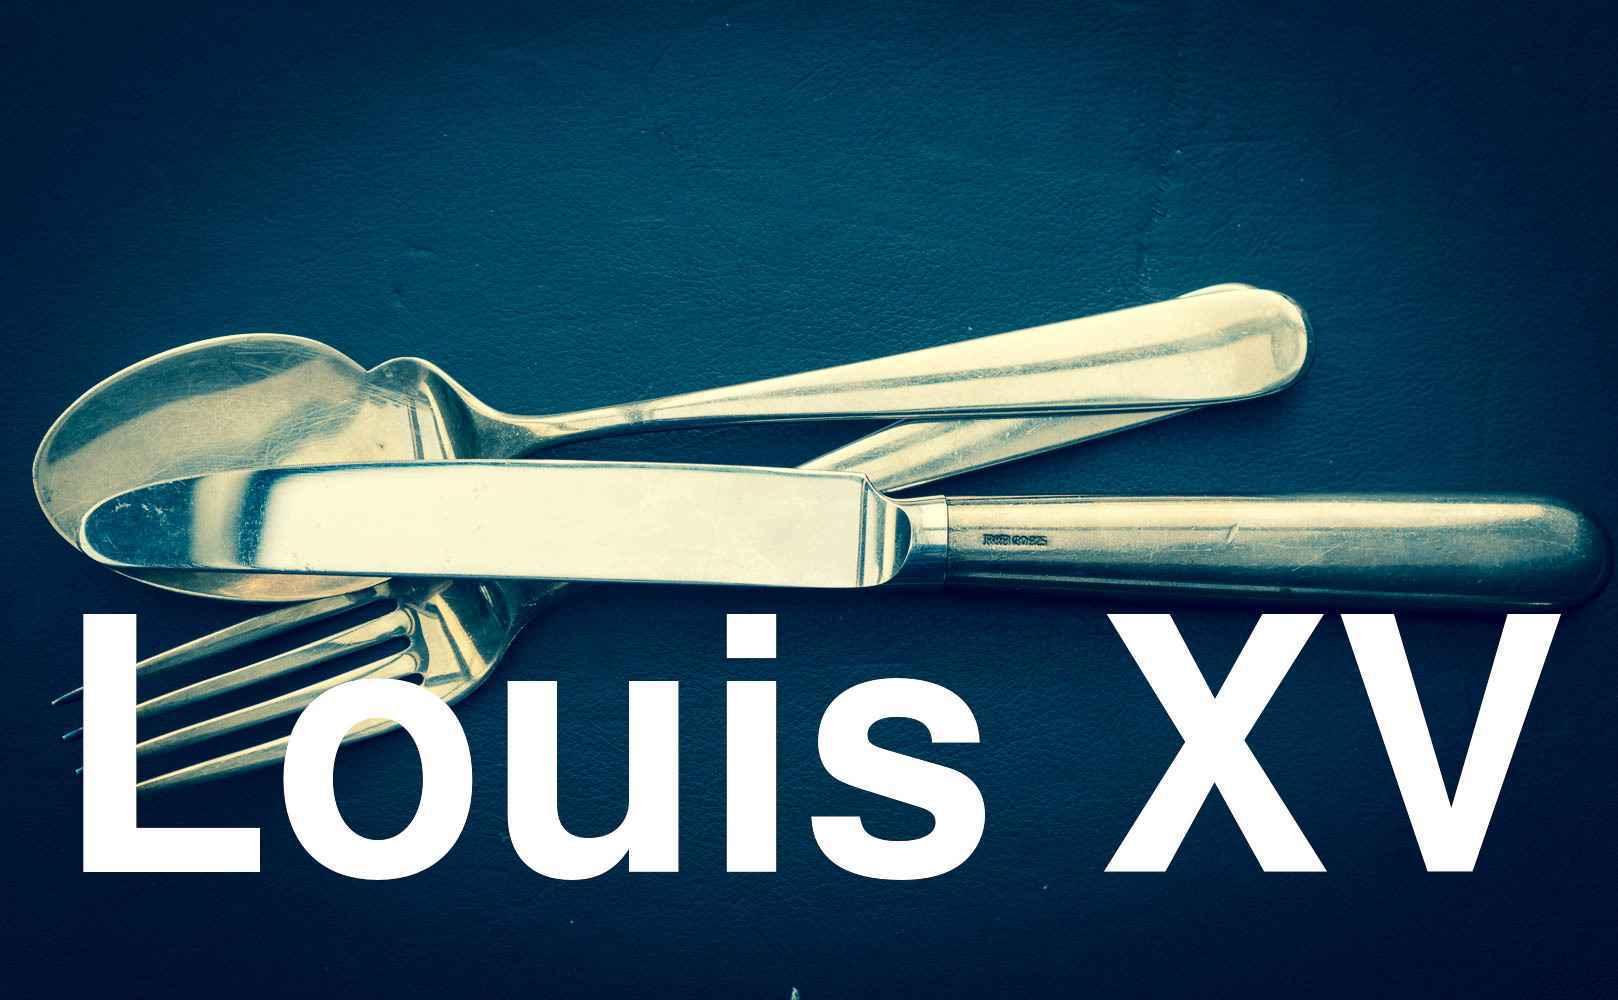 Go to Restaurantkritik: Louis XV in MC 9800 Principauté de Monaco, Monaco